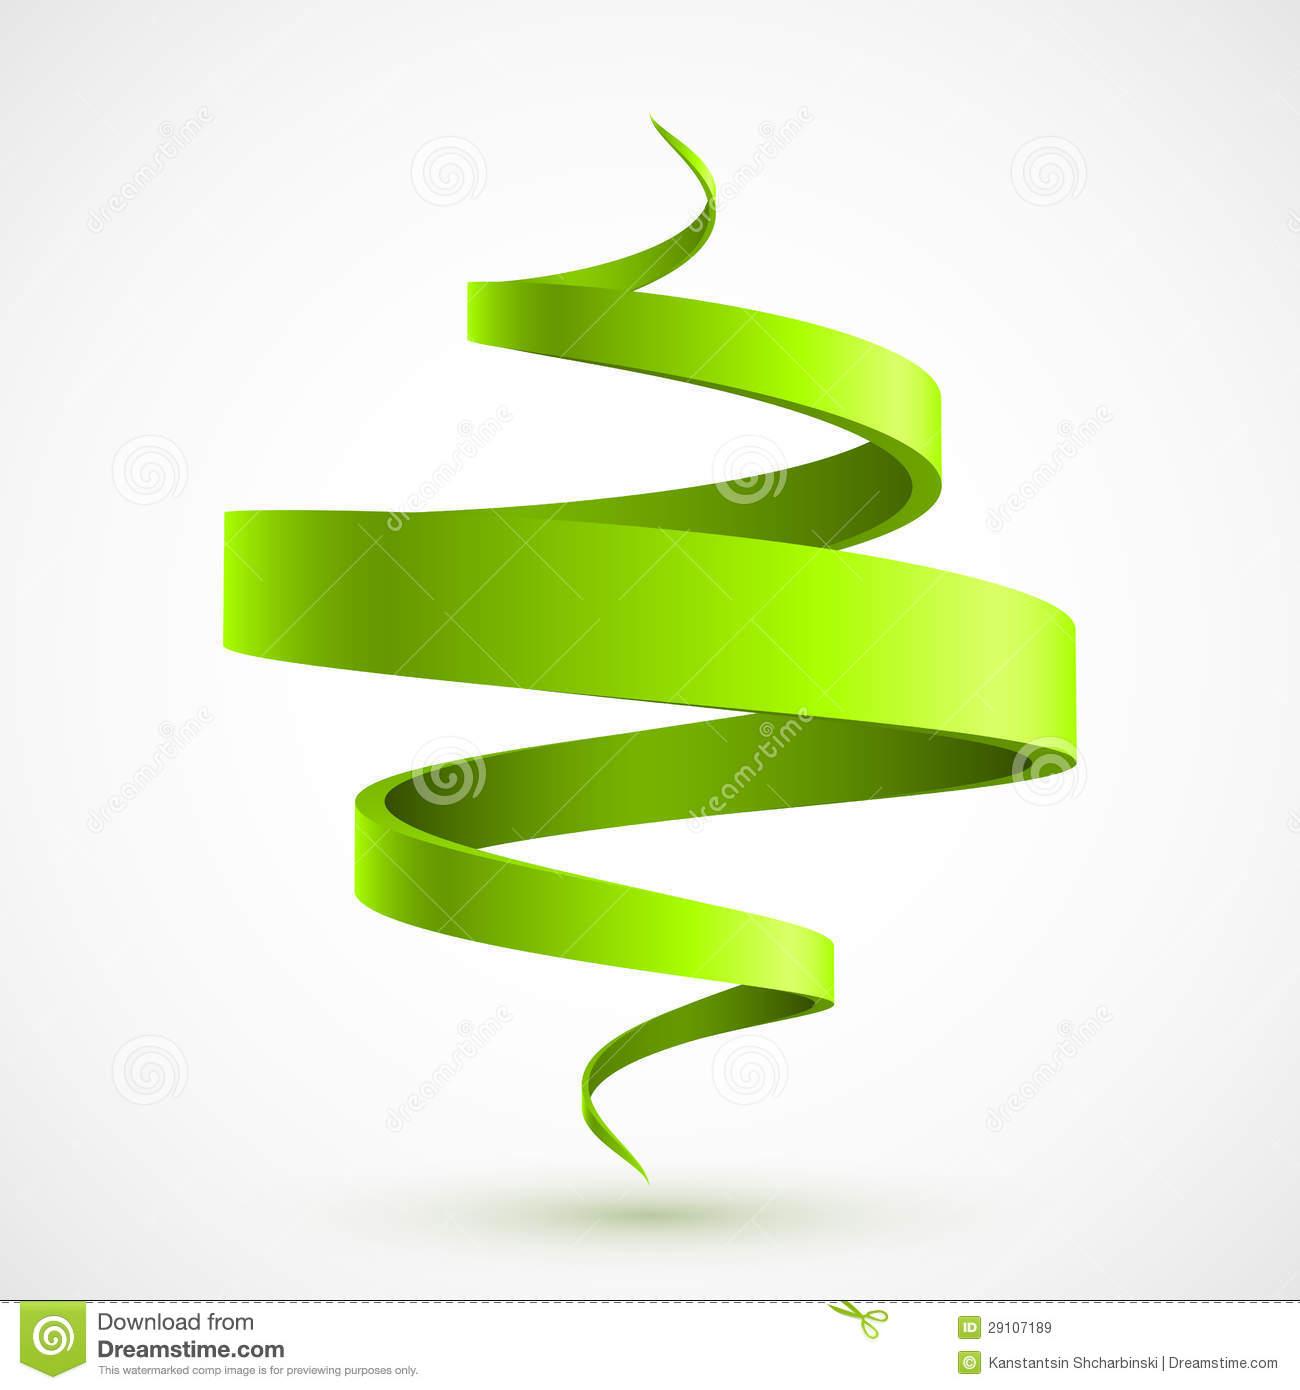 Green spiral 3D stock vector. Illustration of creativity.